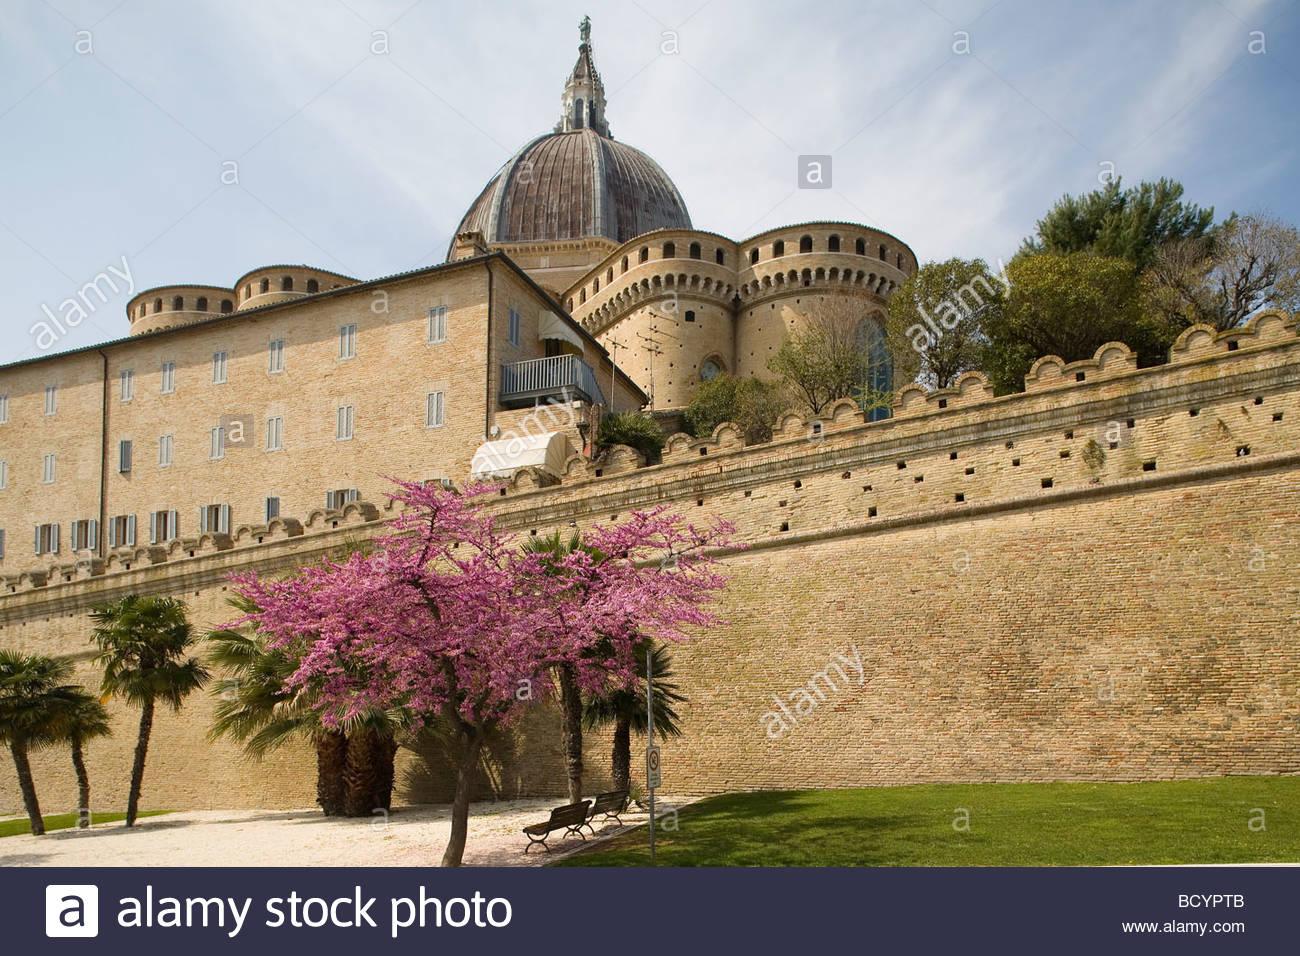 europe, italy, marche, loreto, ancient walls - Stock Image